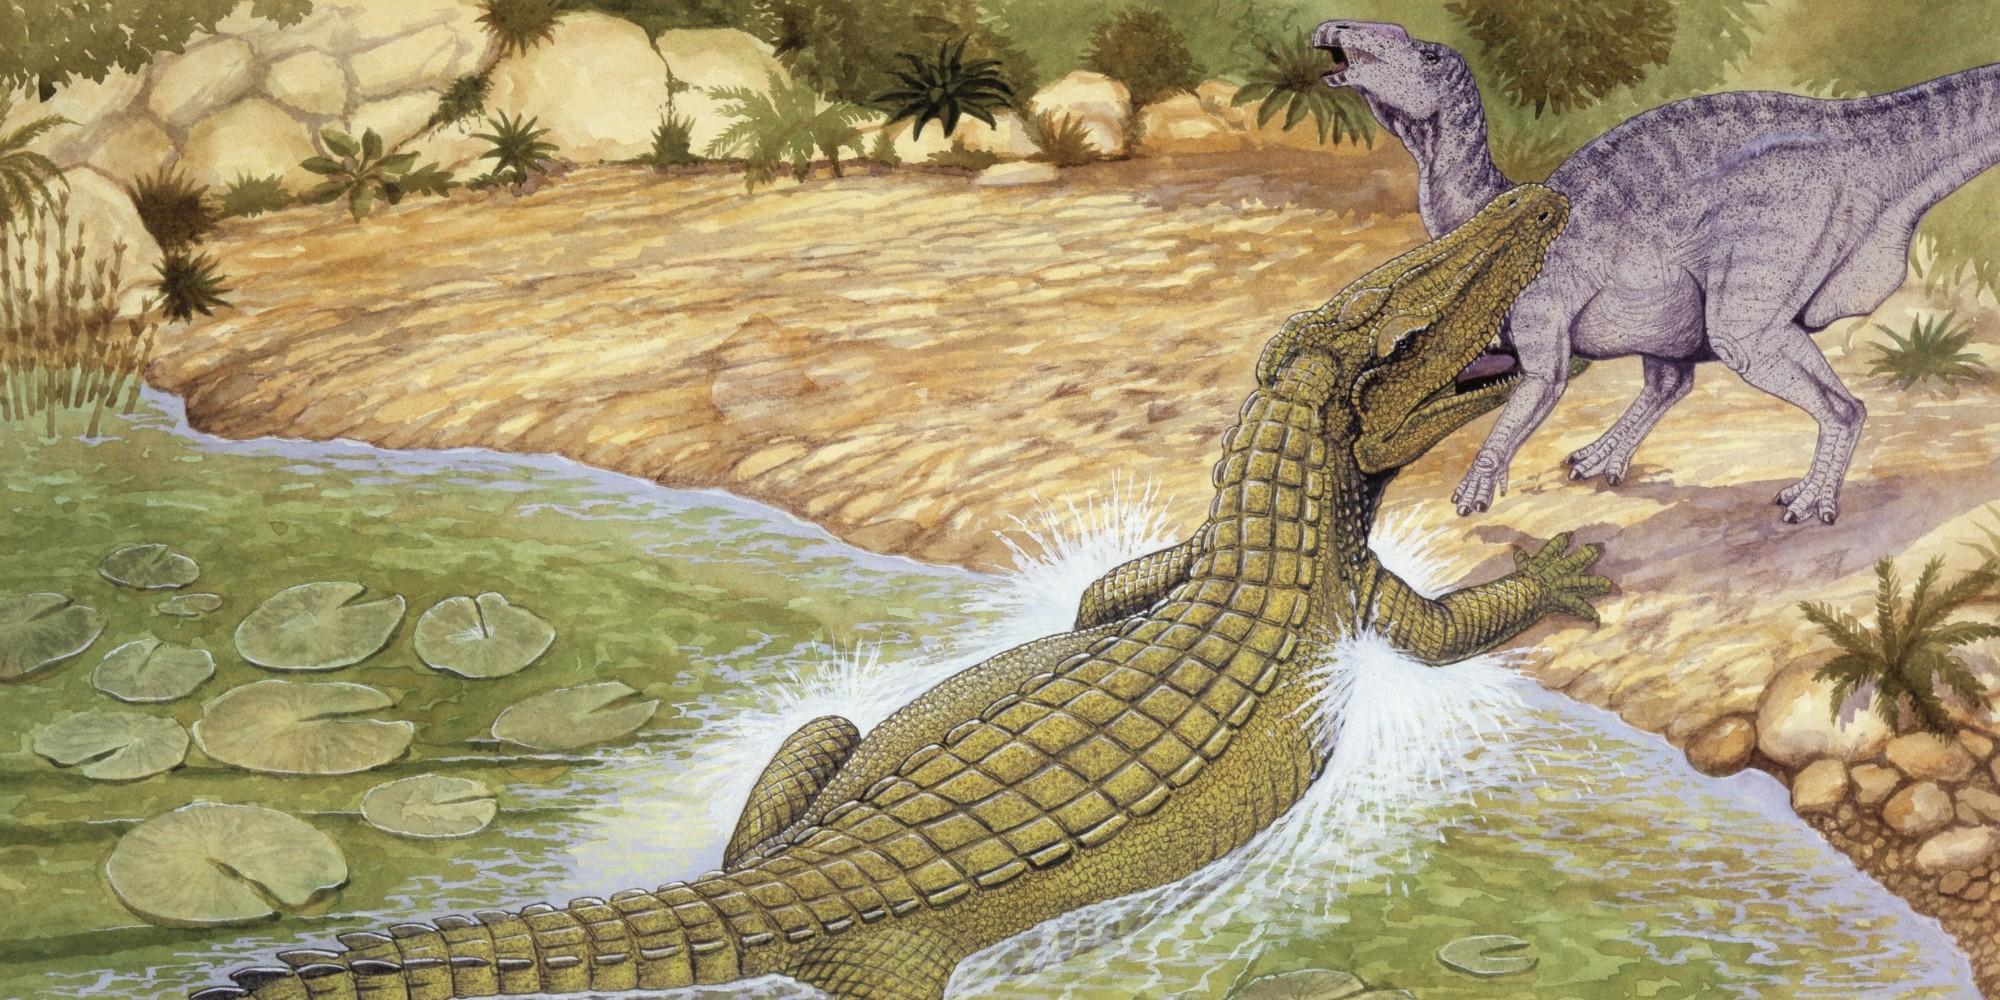 Illustration of Deinosuchus catching prey